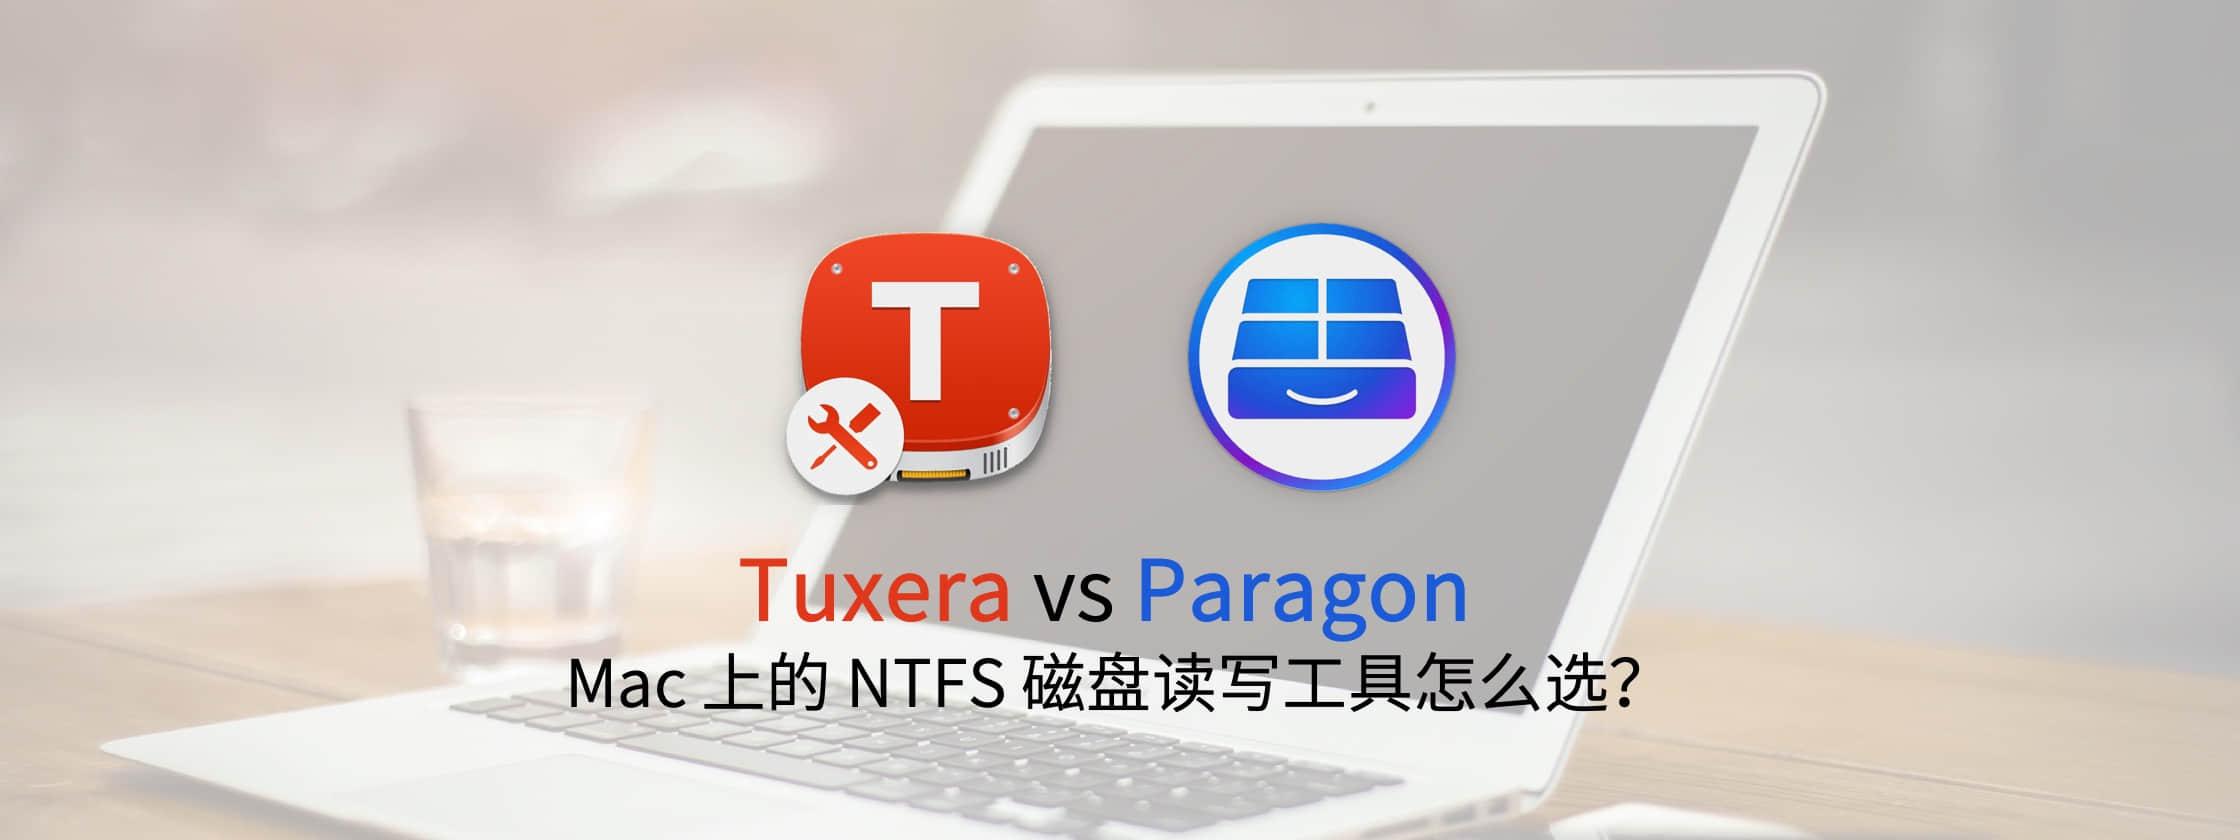 Tuxera vs Paragon: Mac 上的 NTFS 磁盘读写工具怎么选?